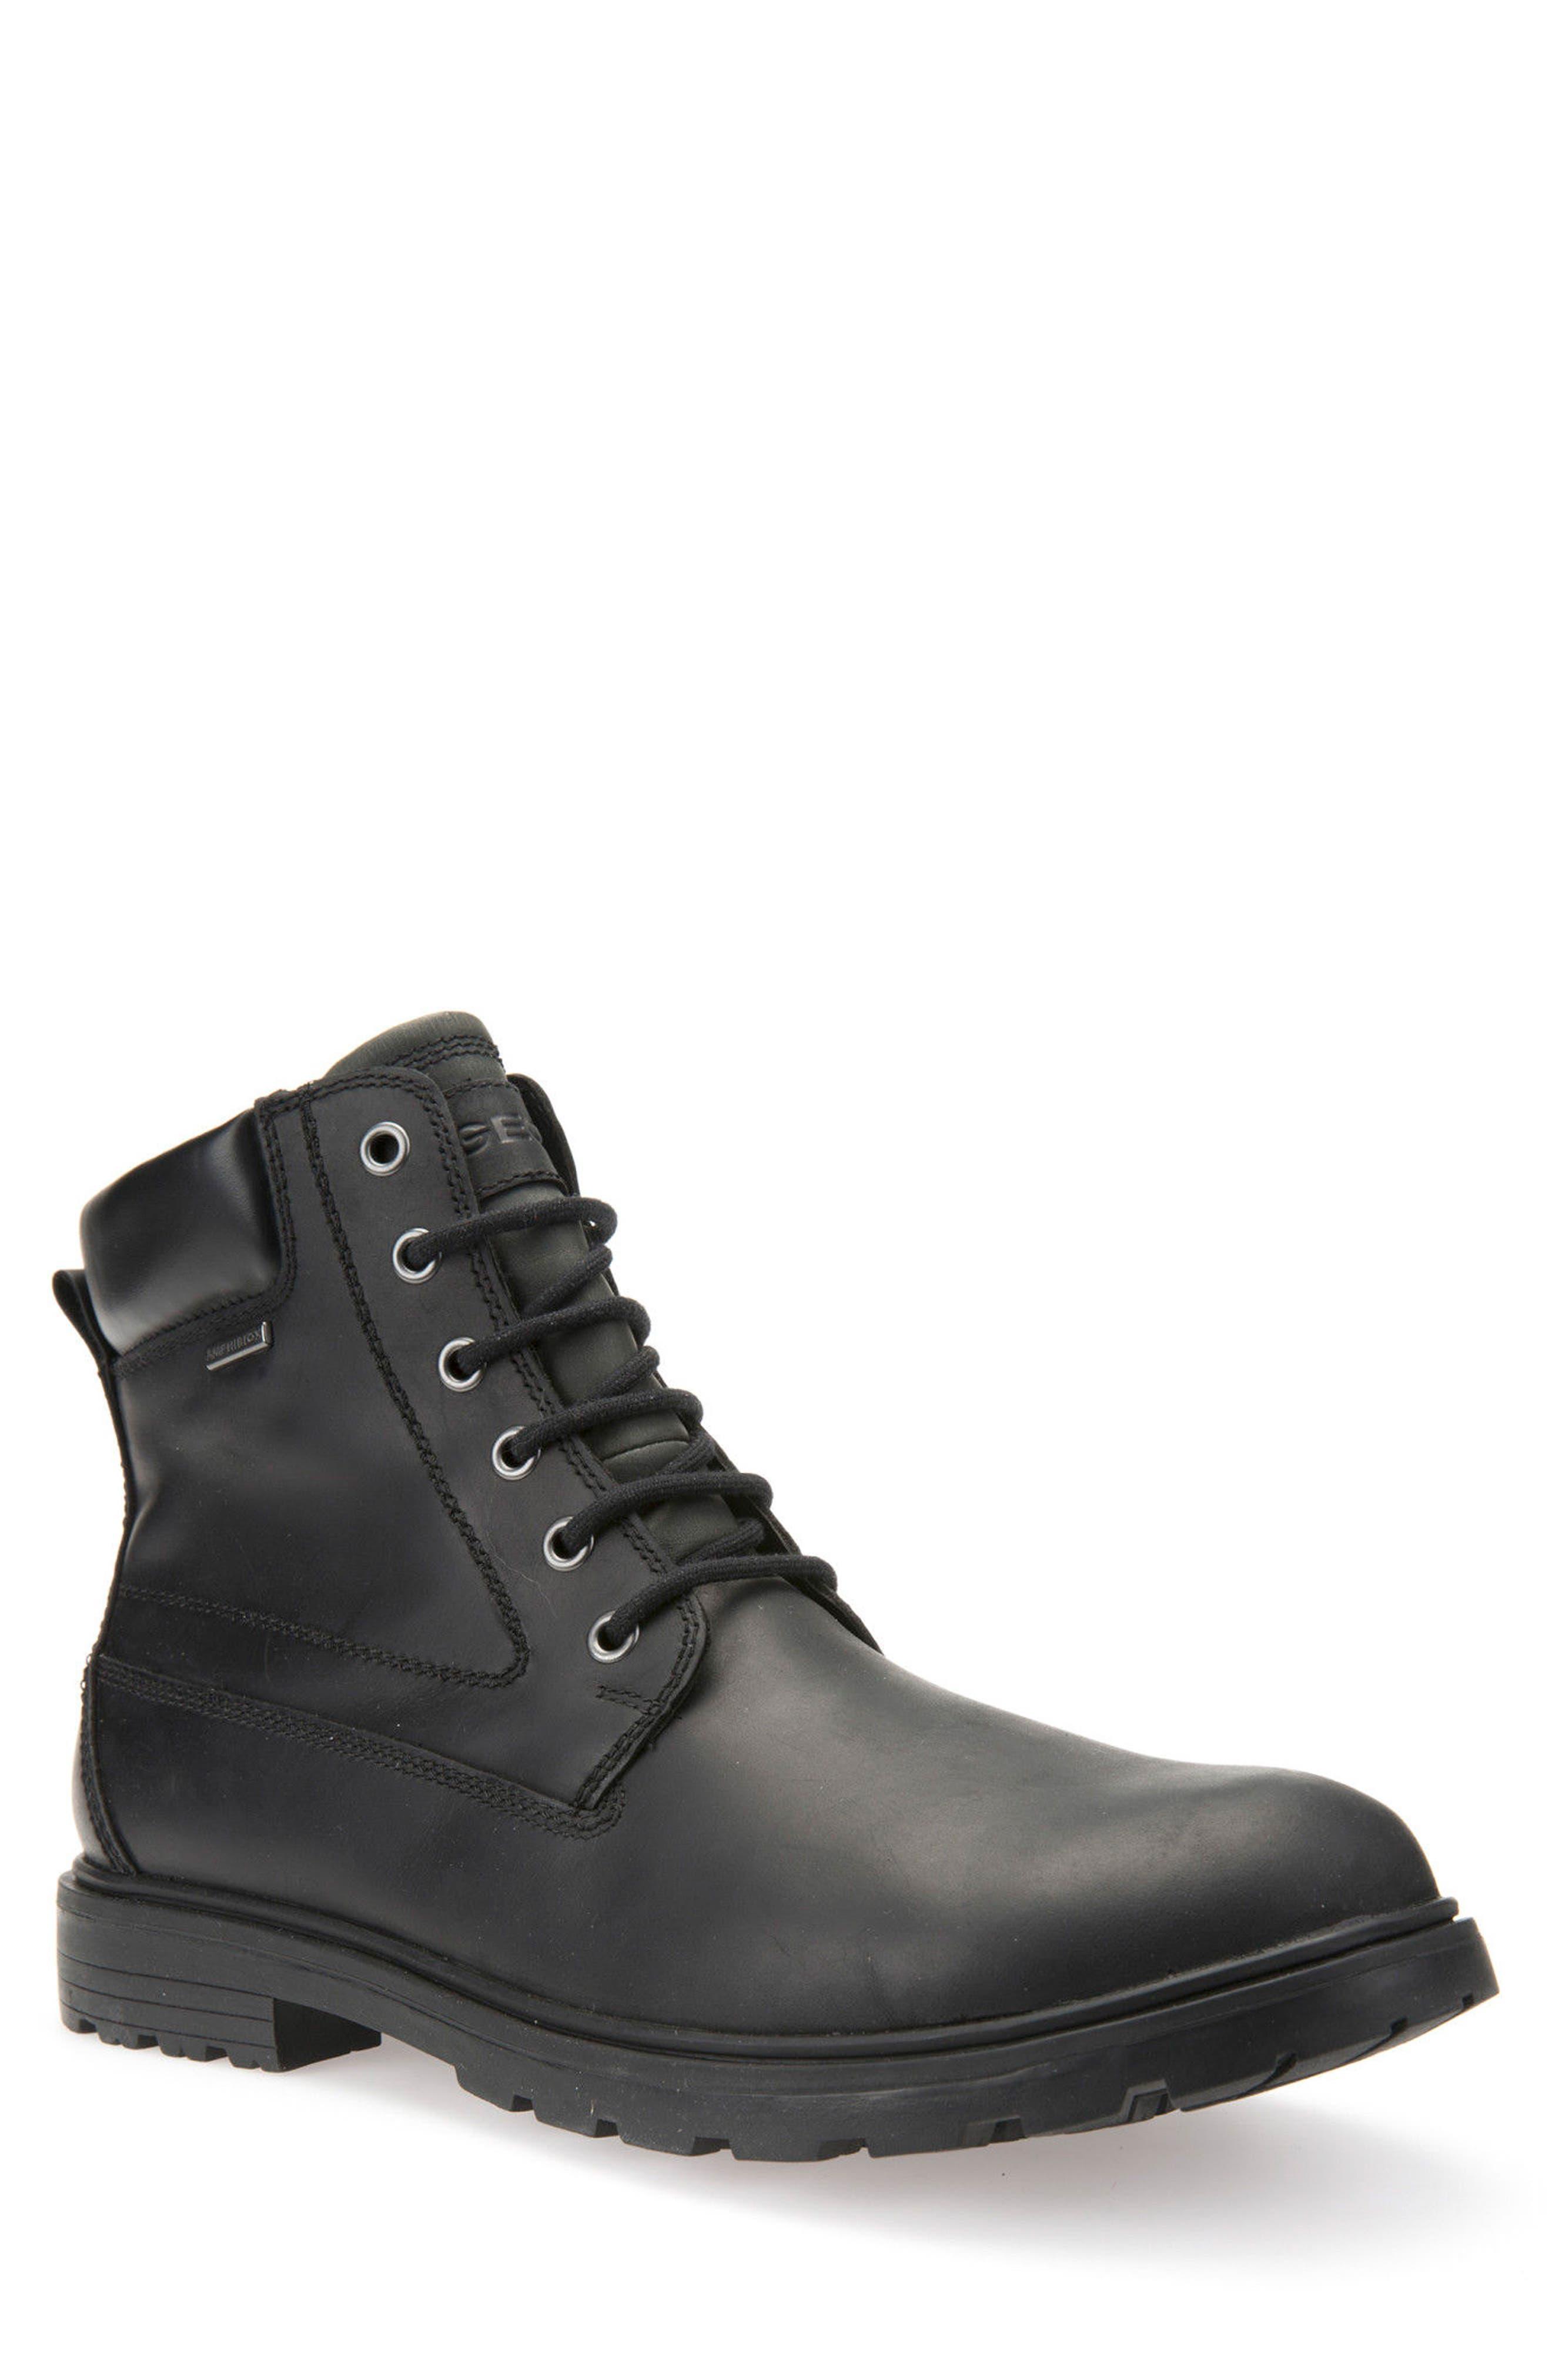 Makim Waterproof Plain Toe Boot,                         Main,                         color, Black